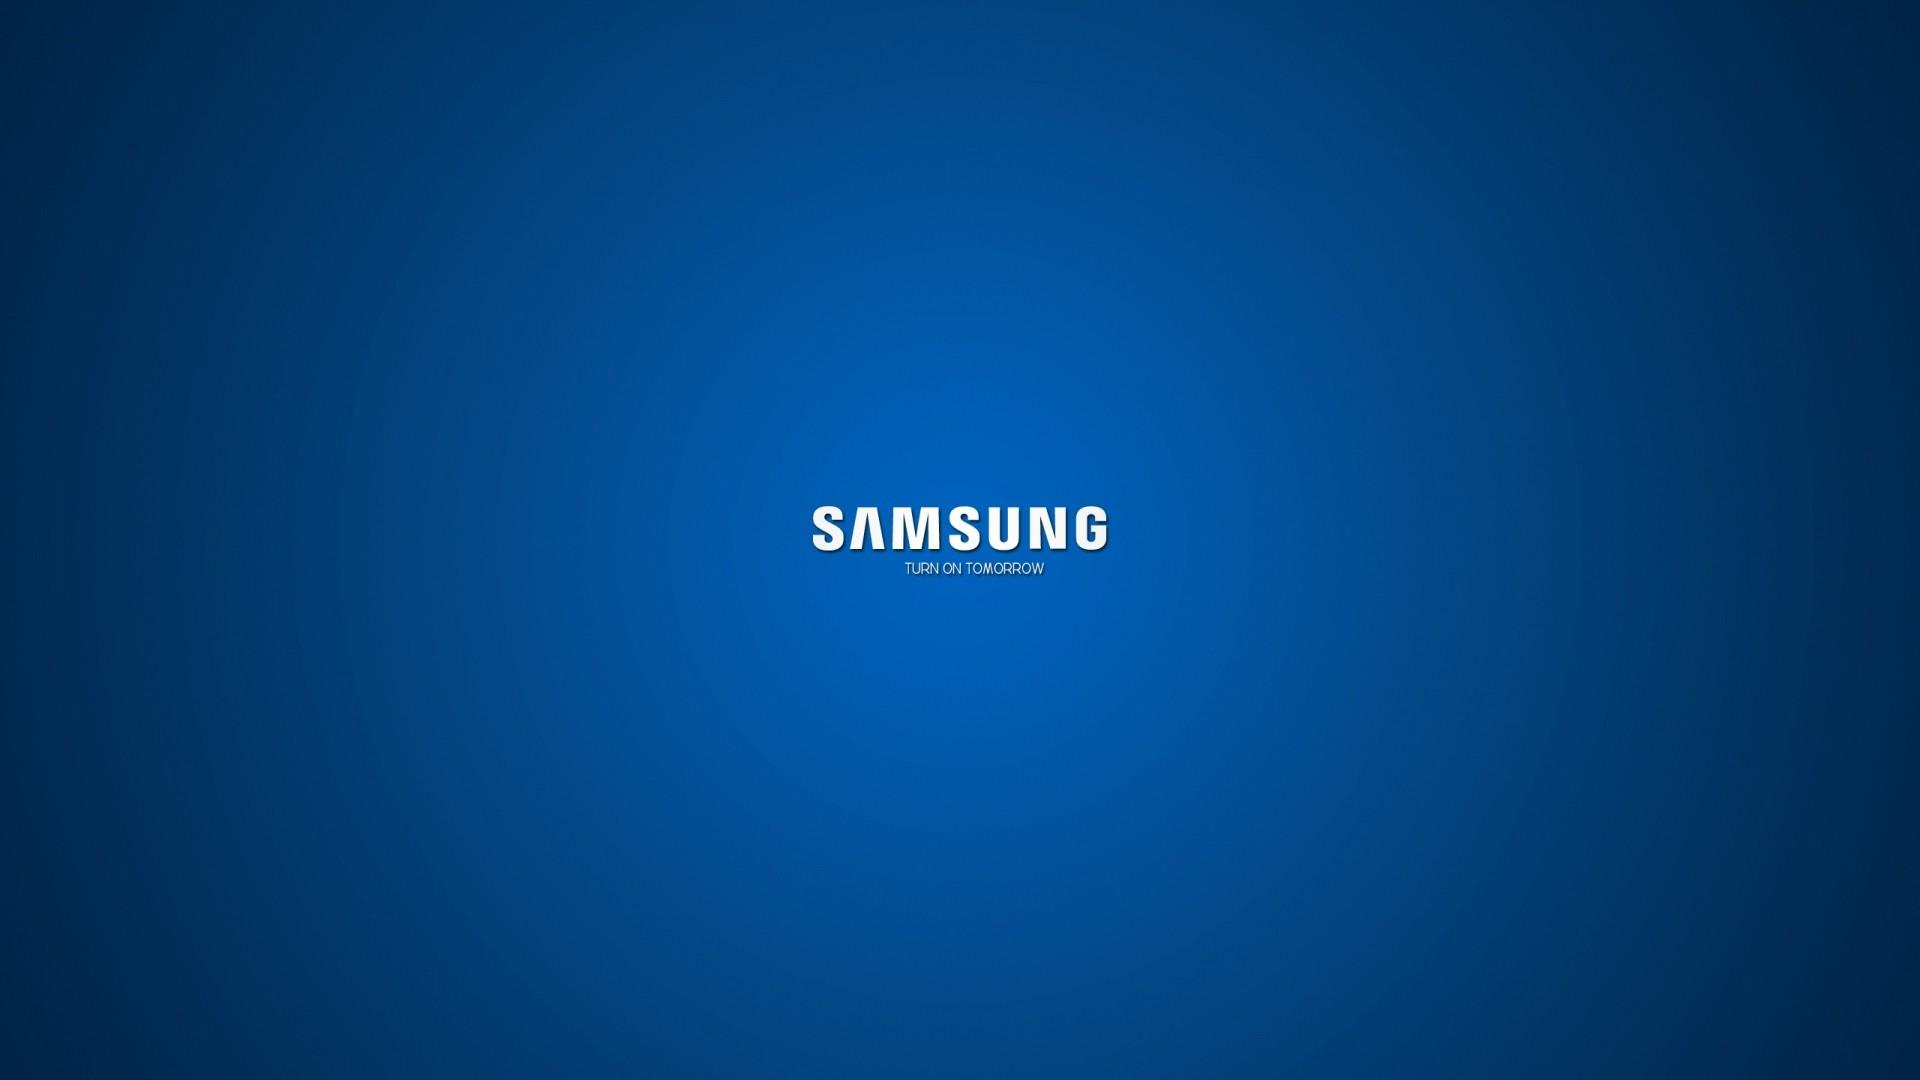 Wallpaper samsung, company, logo, blue, white